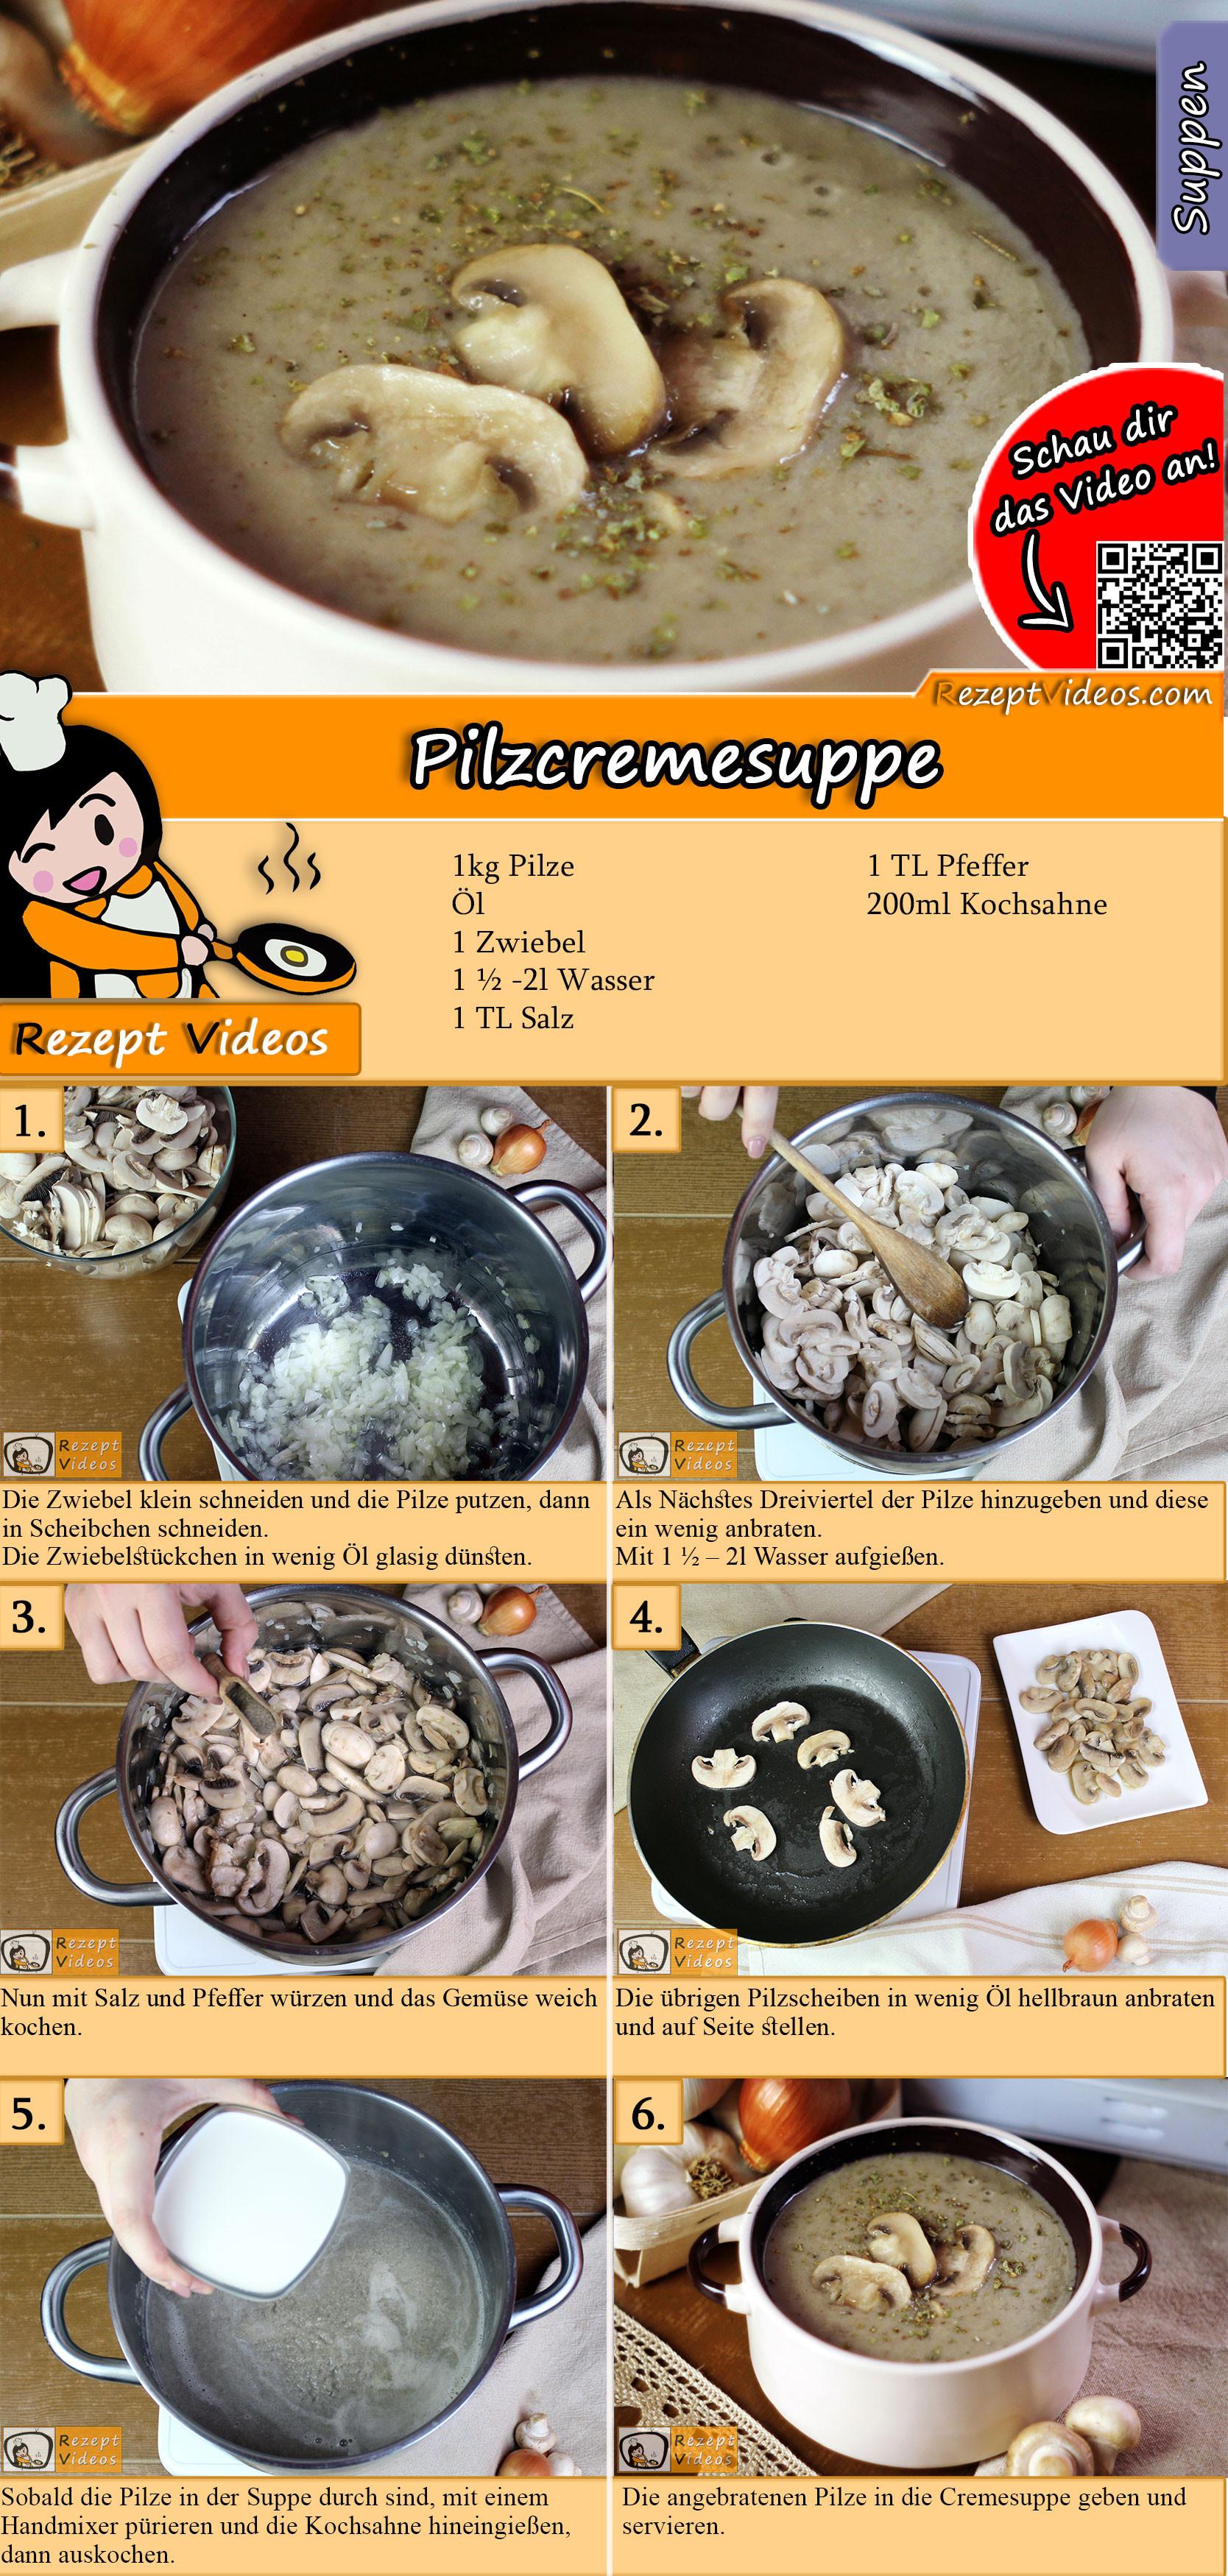 Pilzcremesuppe Rezept mit Video